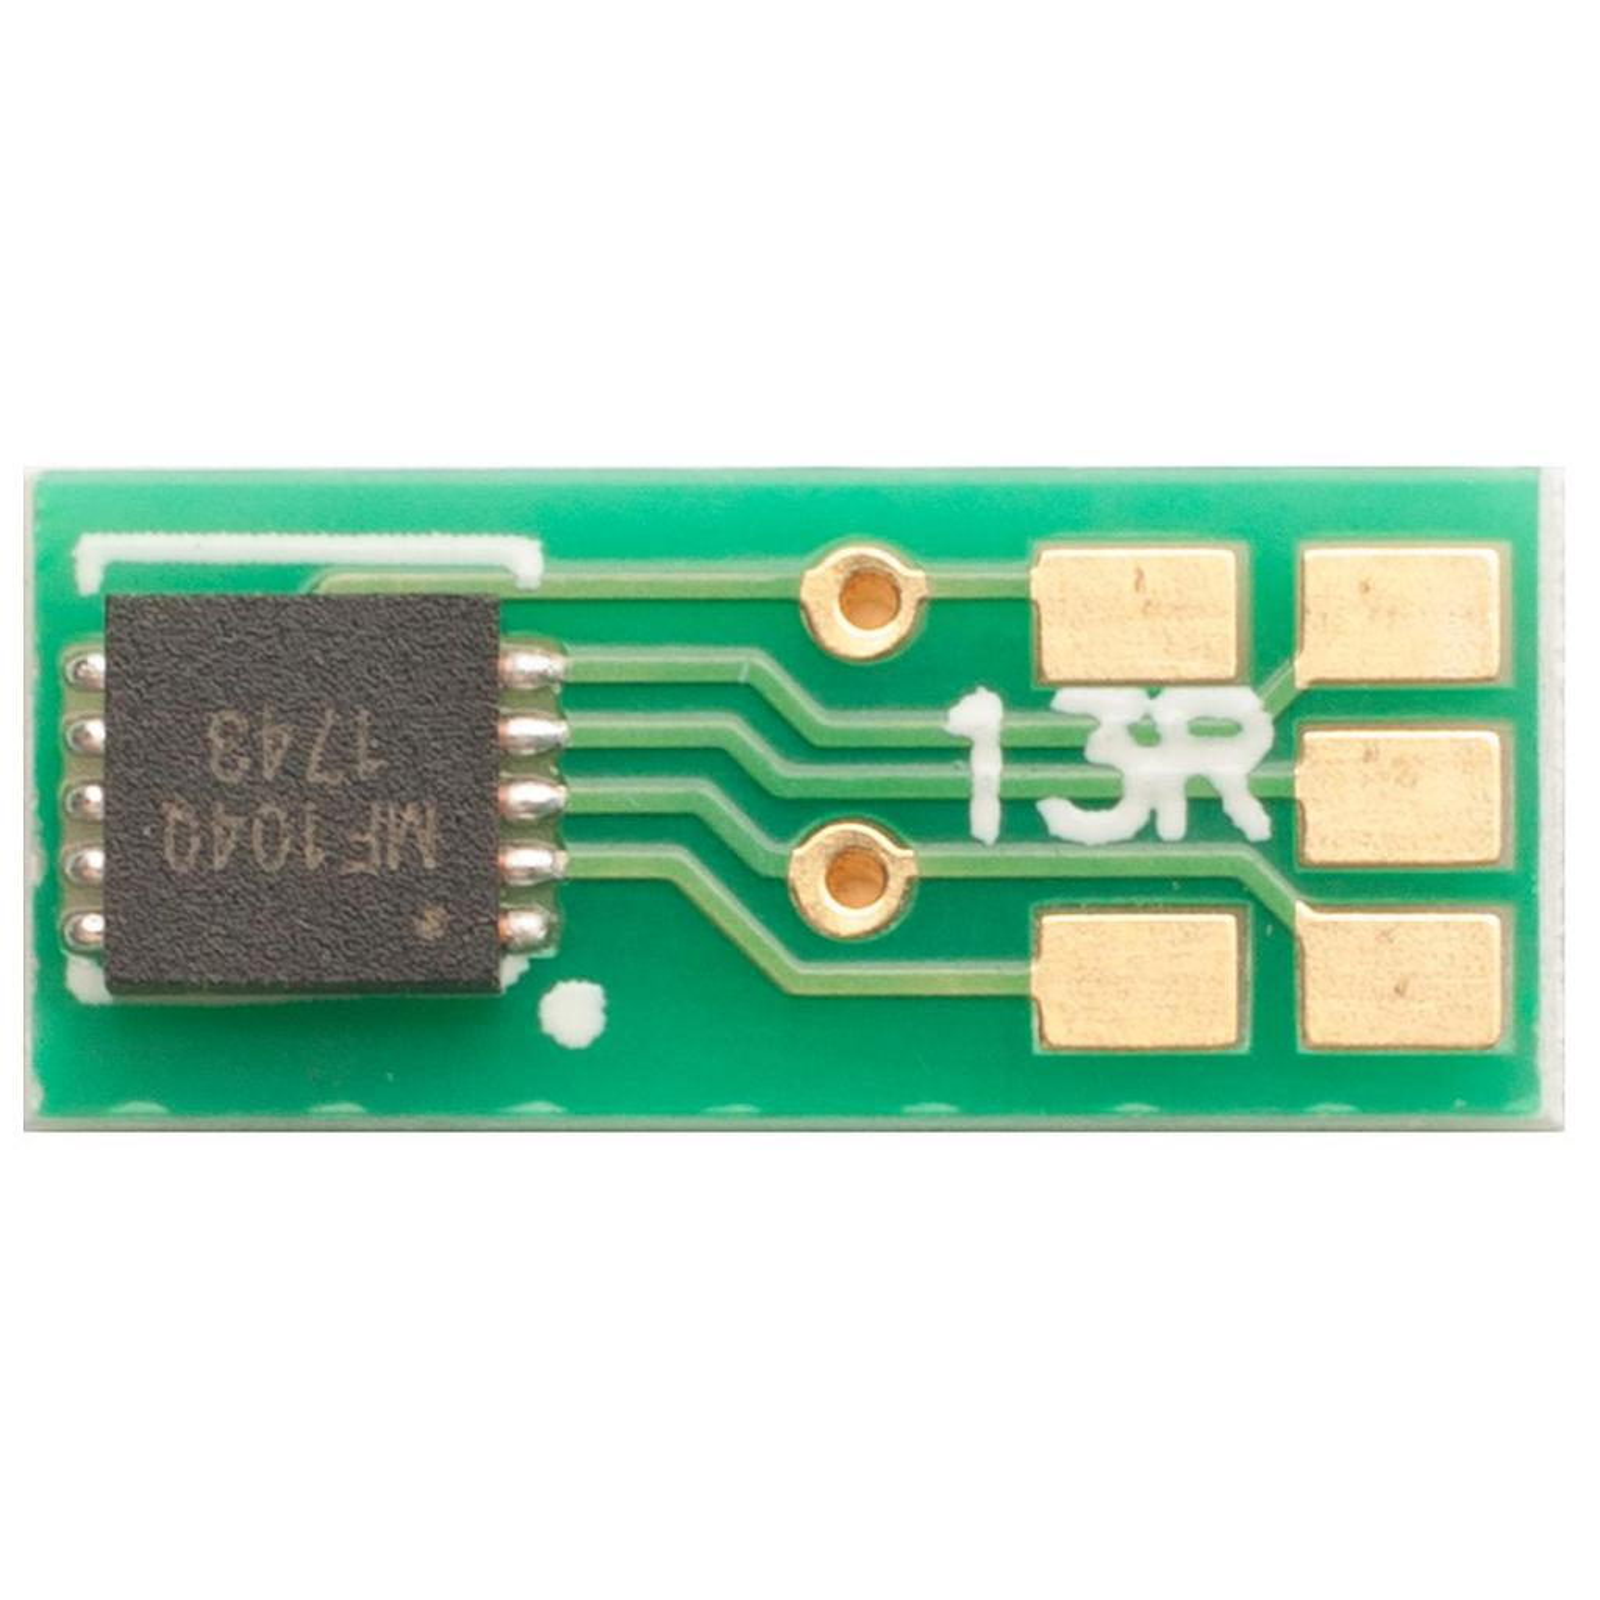 Чип для картриджа CANON 045 BLACK Everprint (CHIP-CAN-045-B)